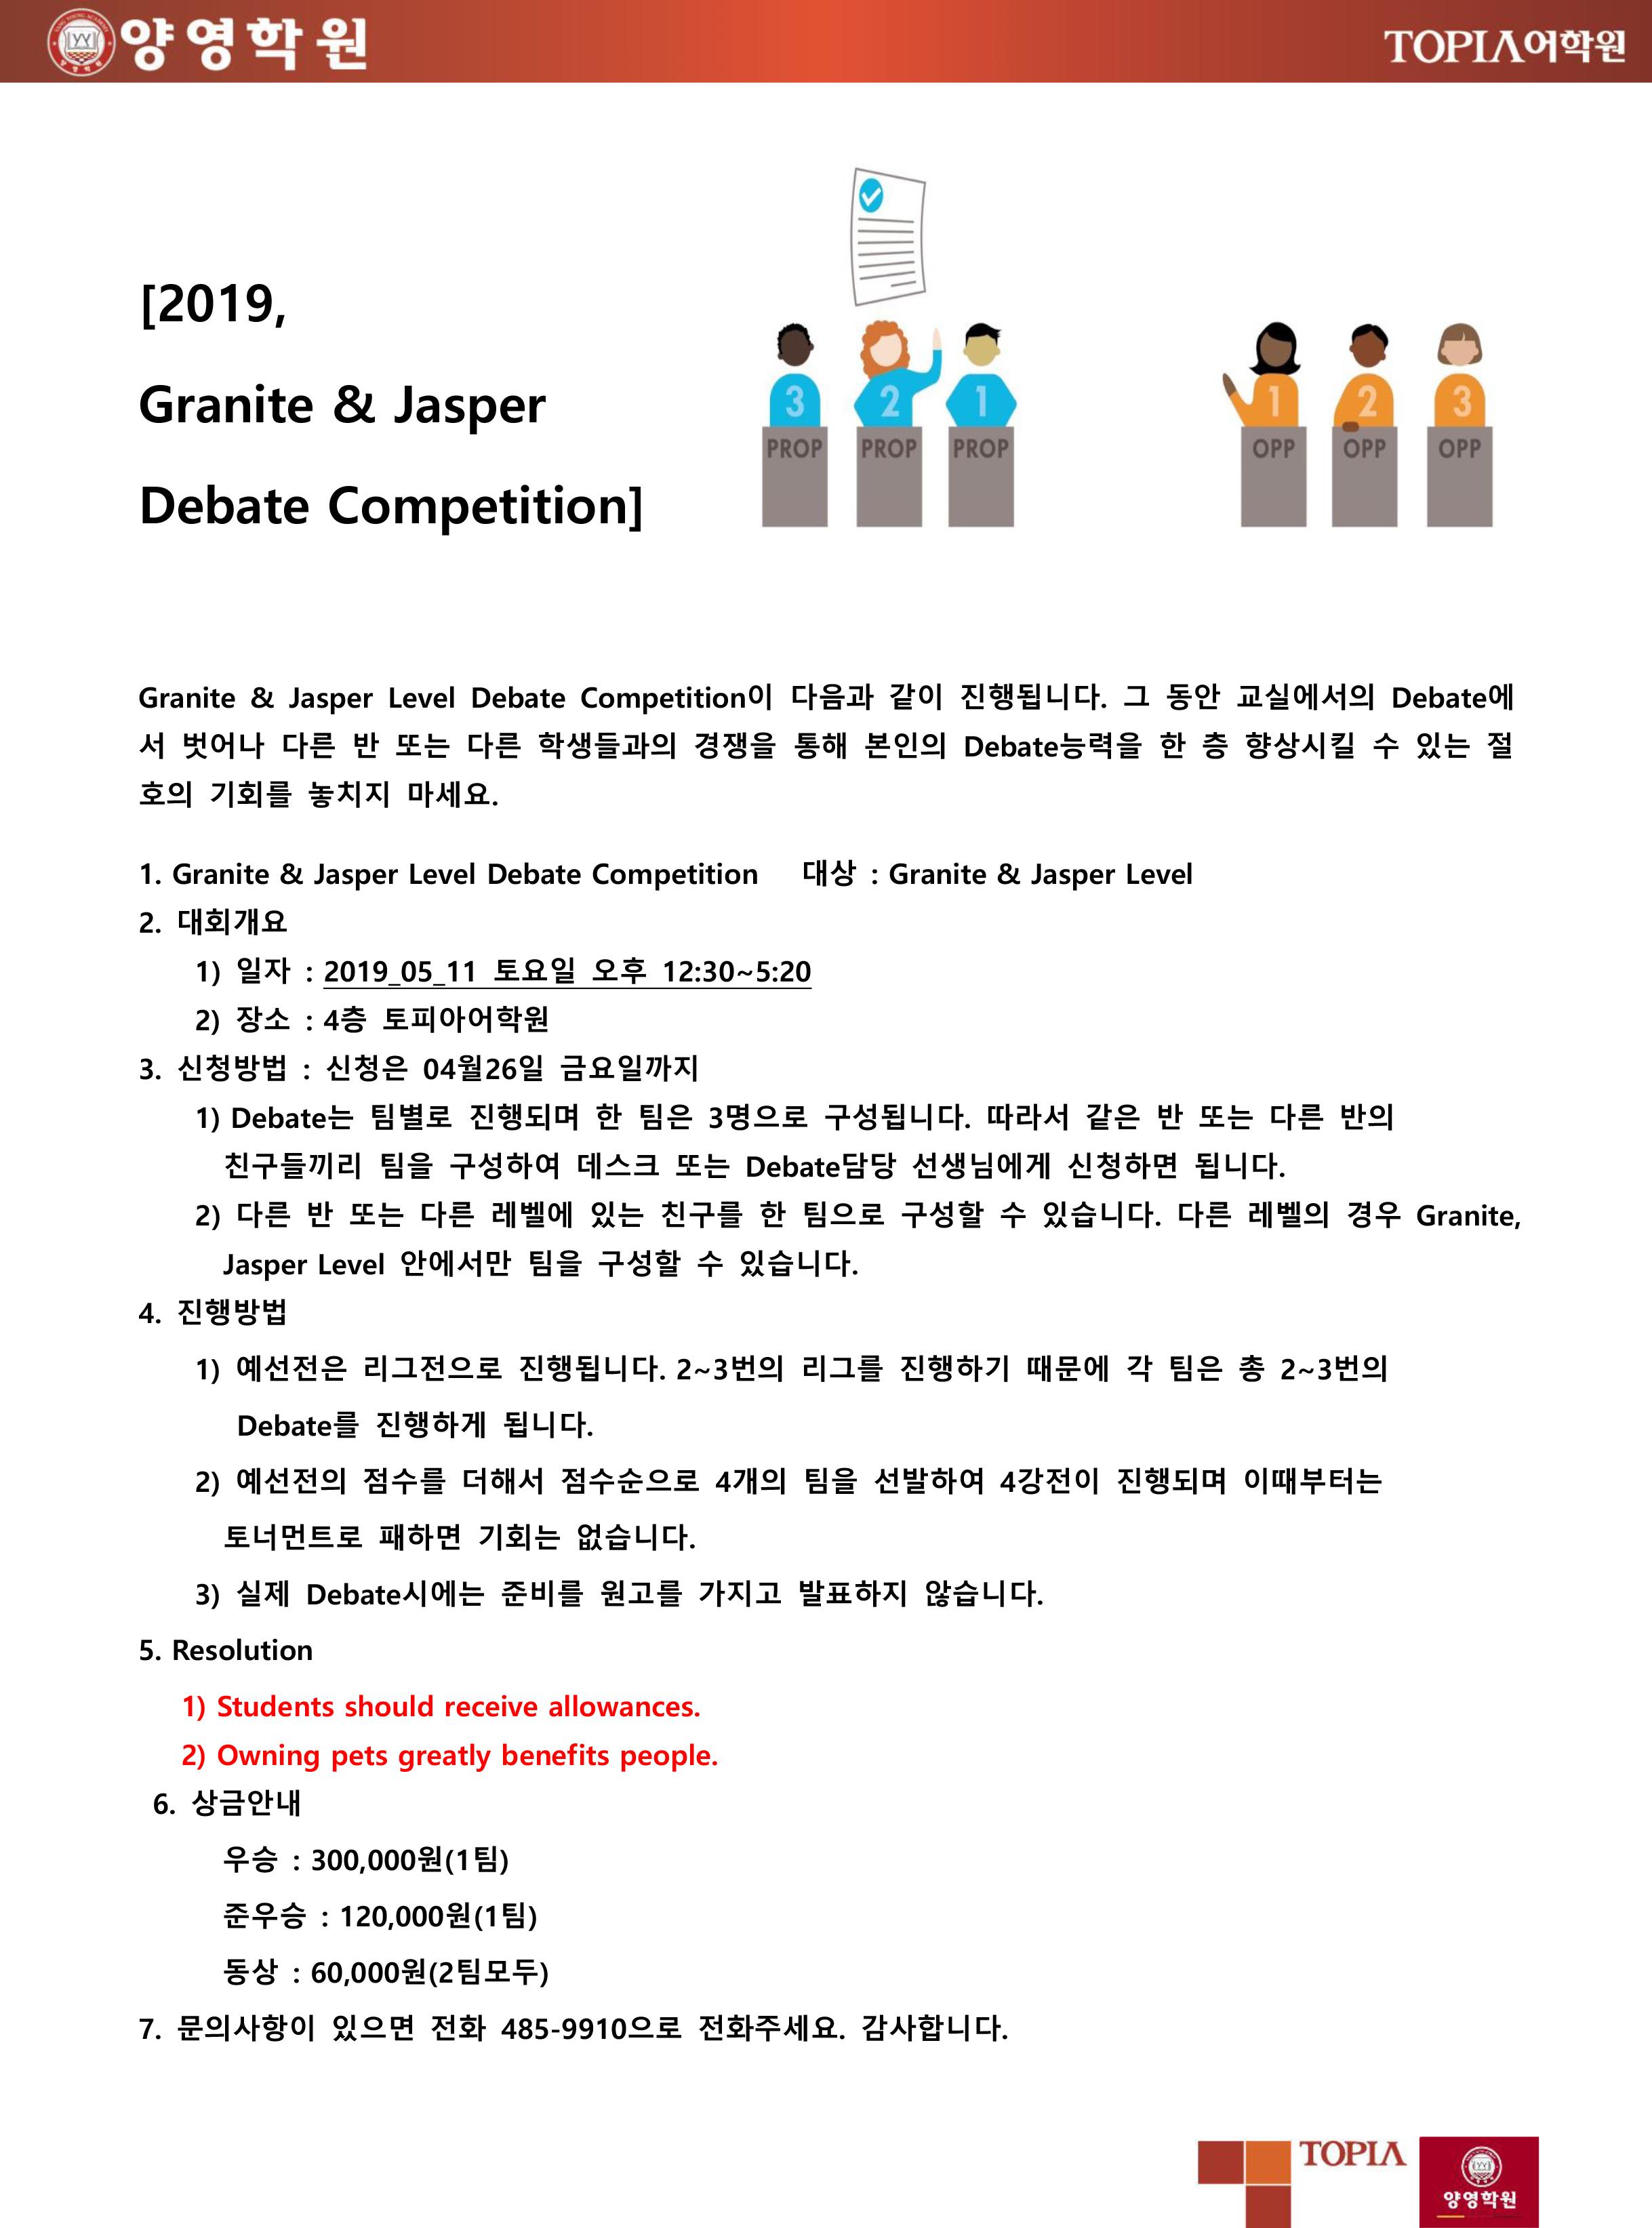 2019_05_11_Debate Competition_안내문.jpg